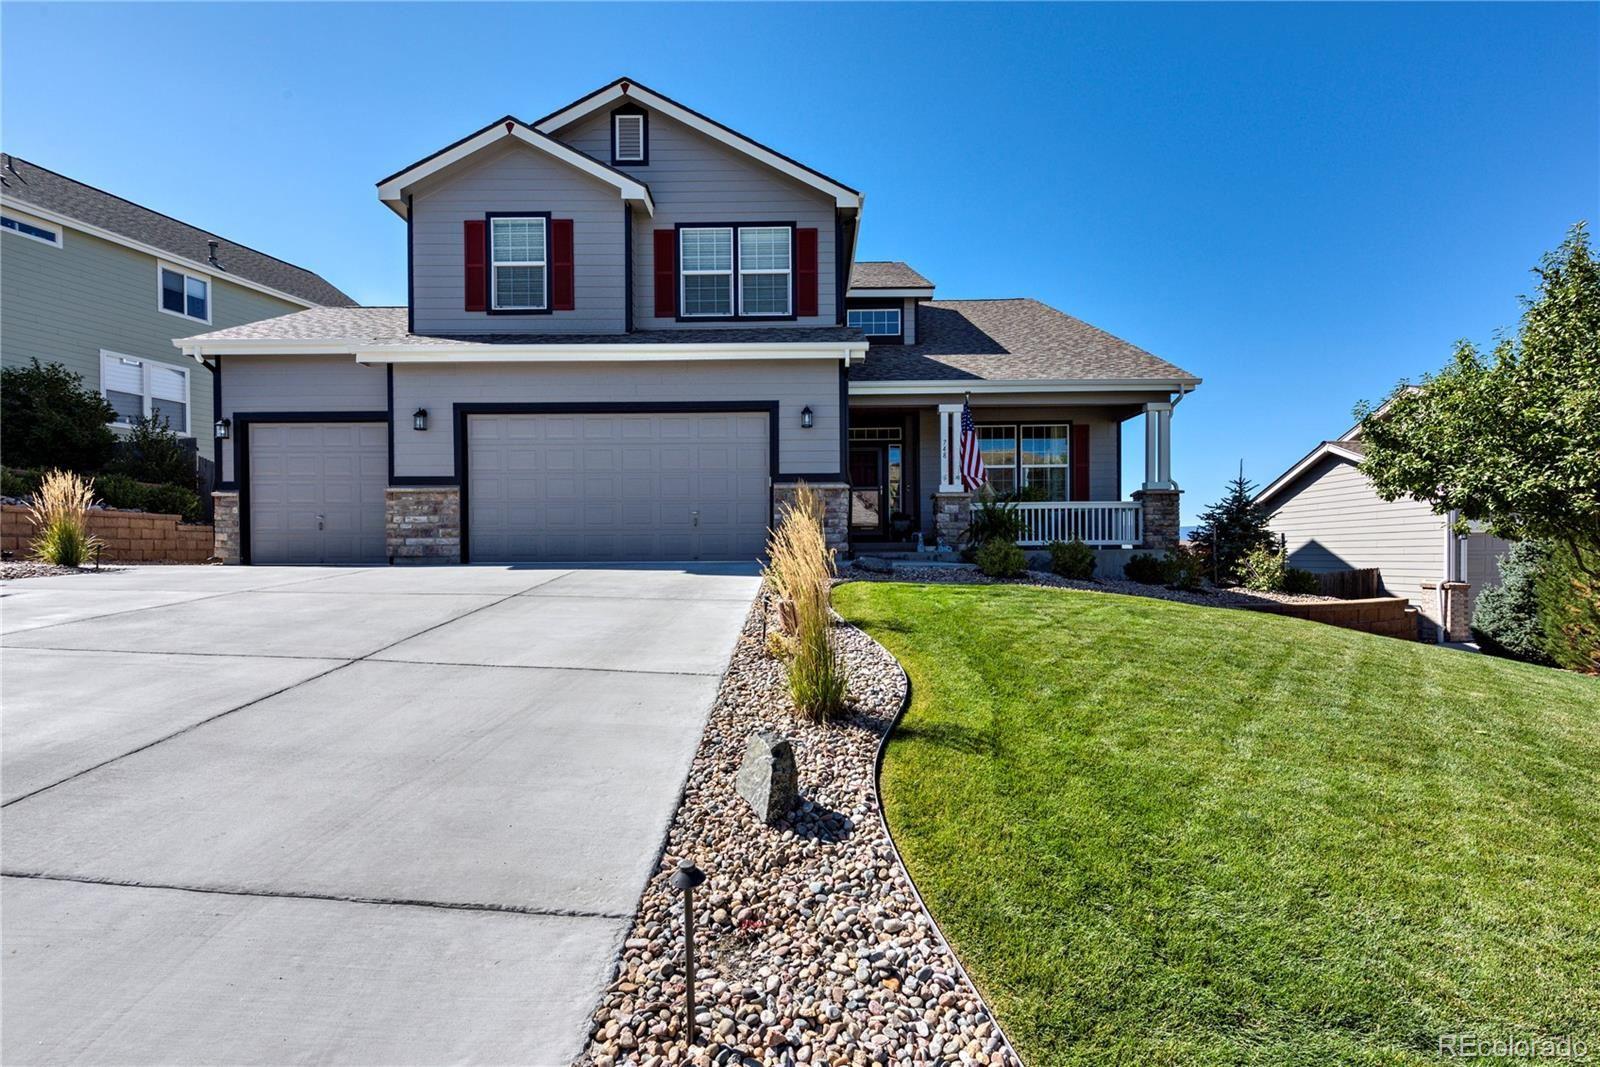 748 Eaglestone Drive, Castle Rock, CO 80104 - MLS#: 9740496